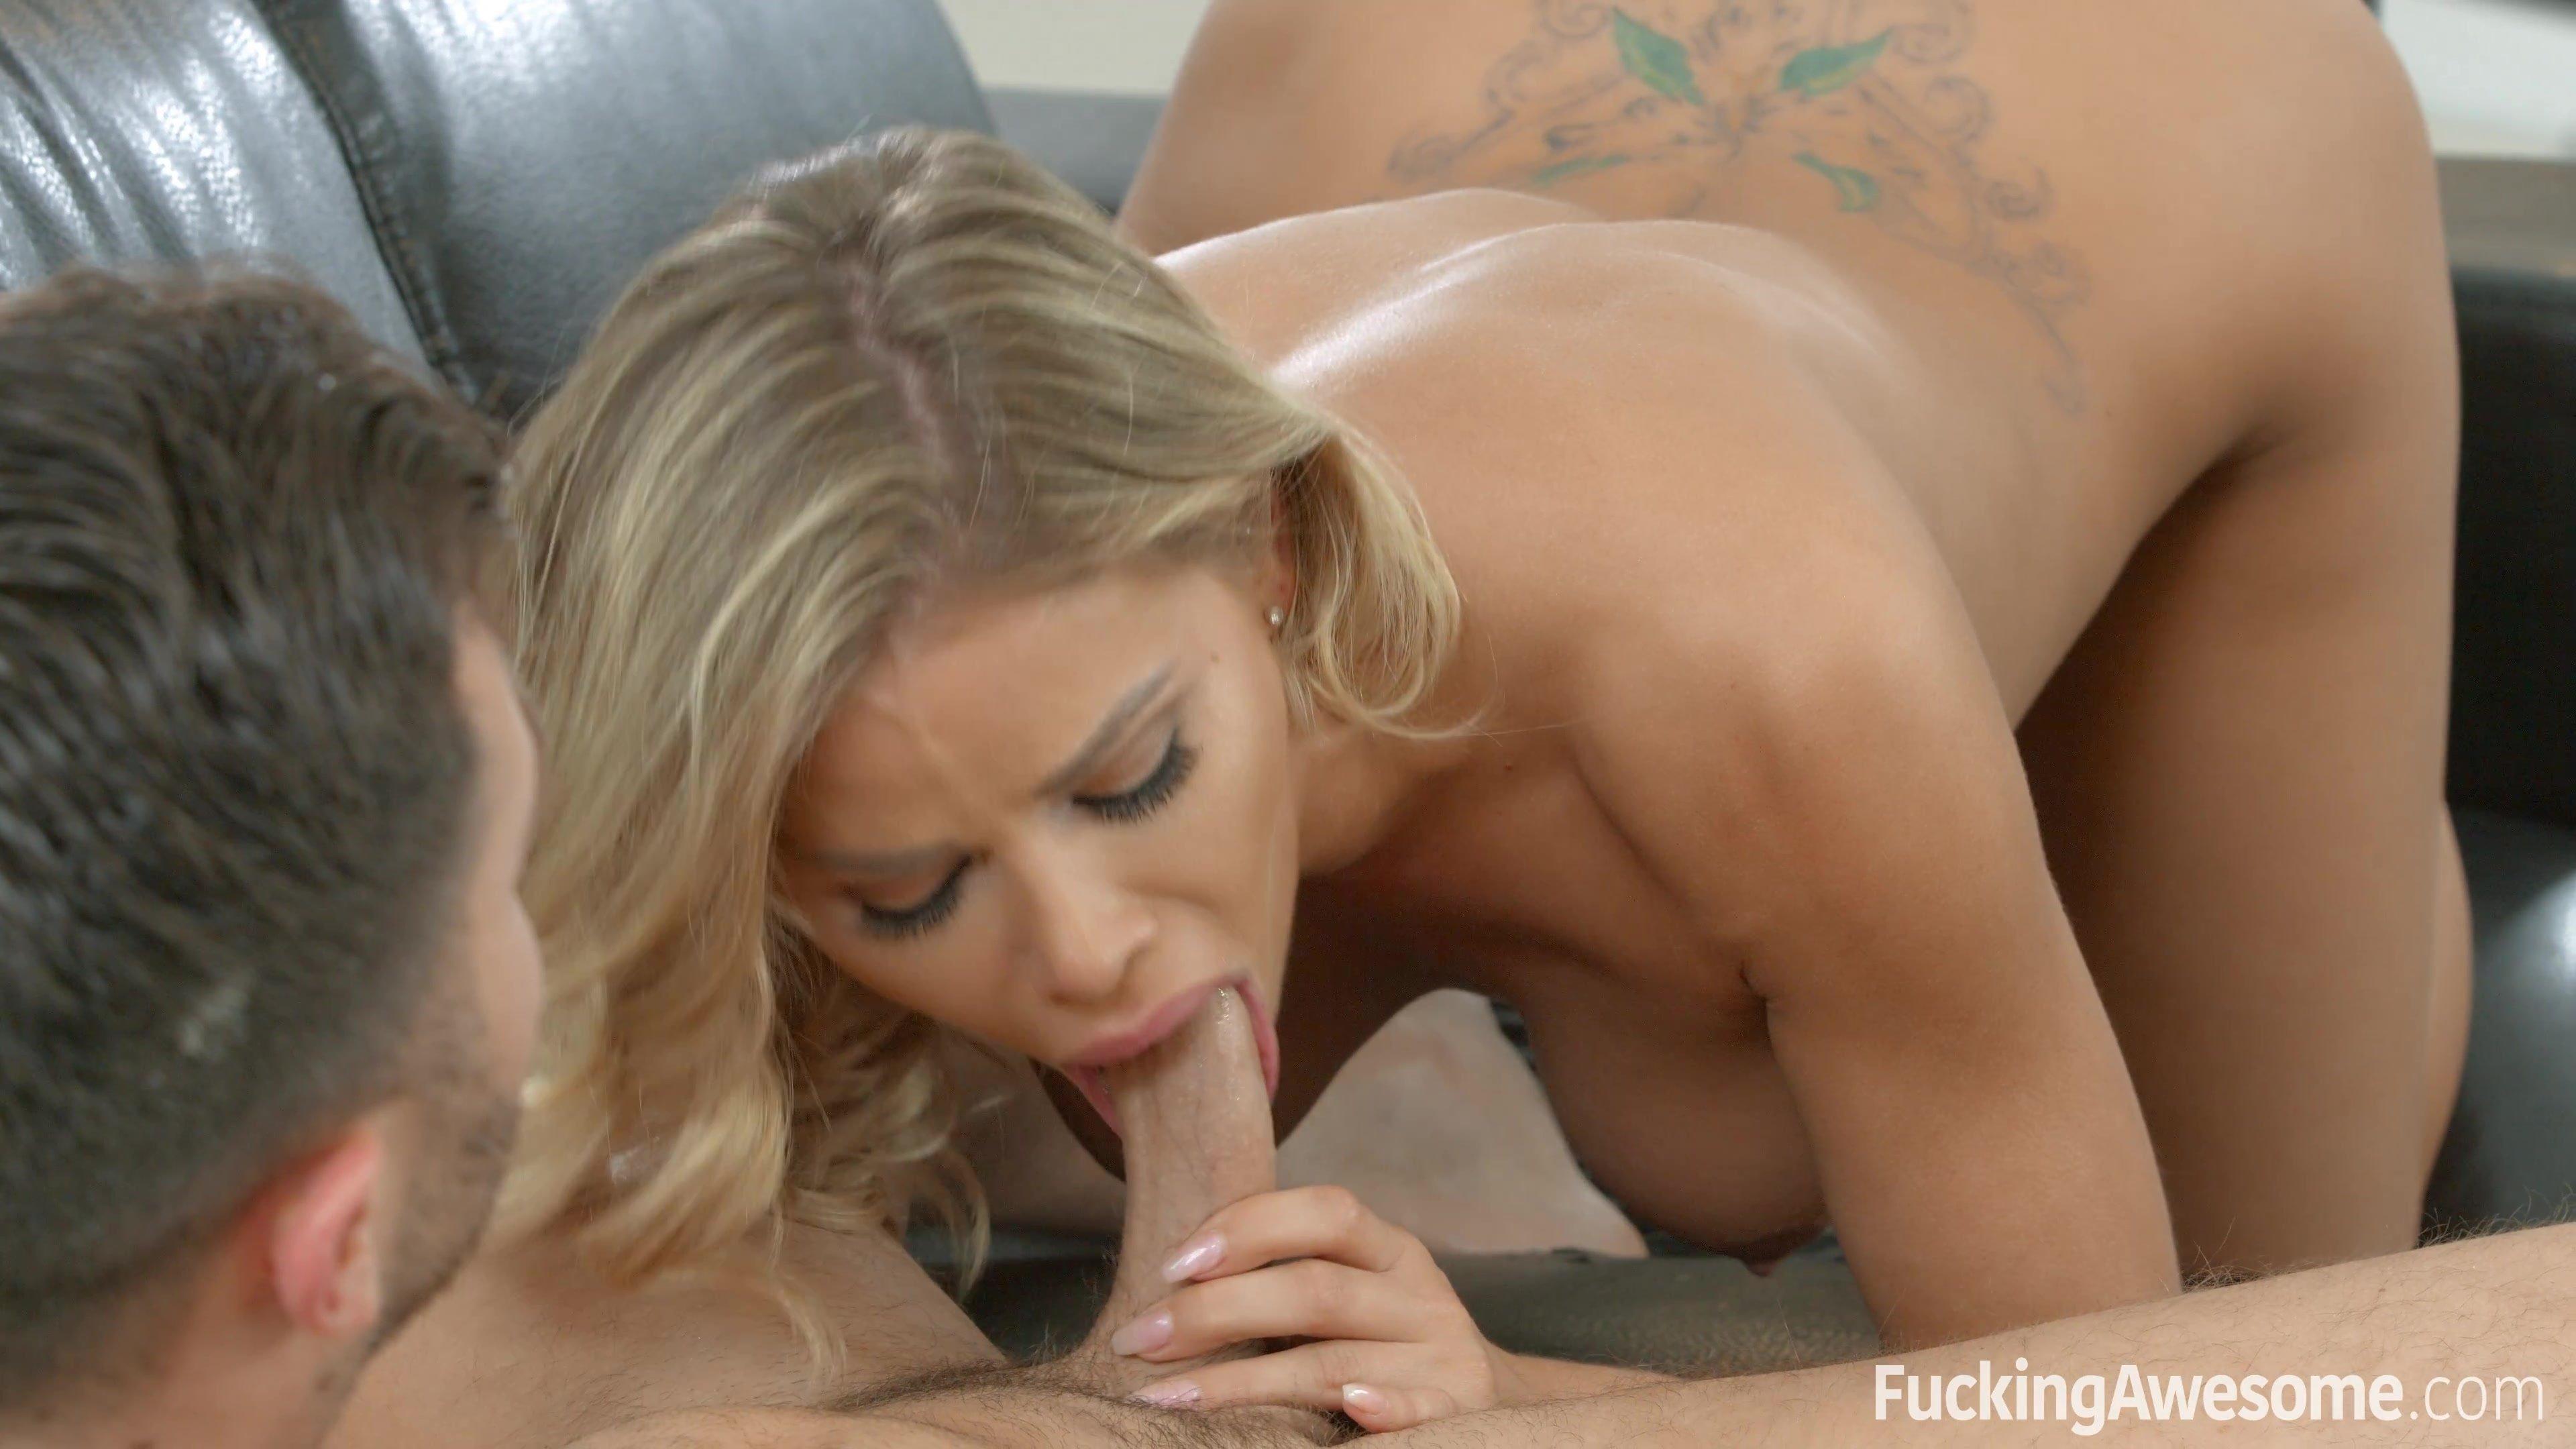 Free jessa rhodes anal porn pics